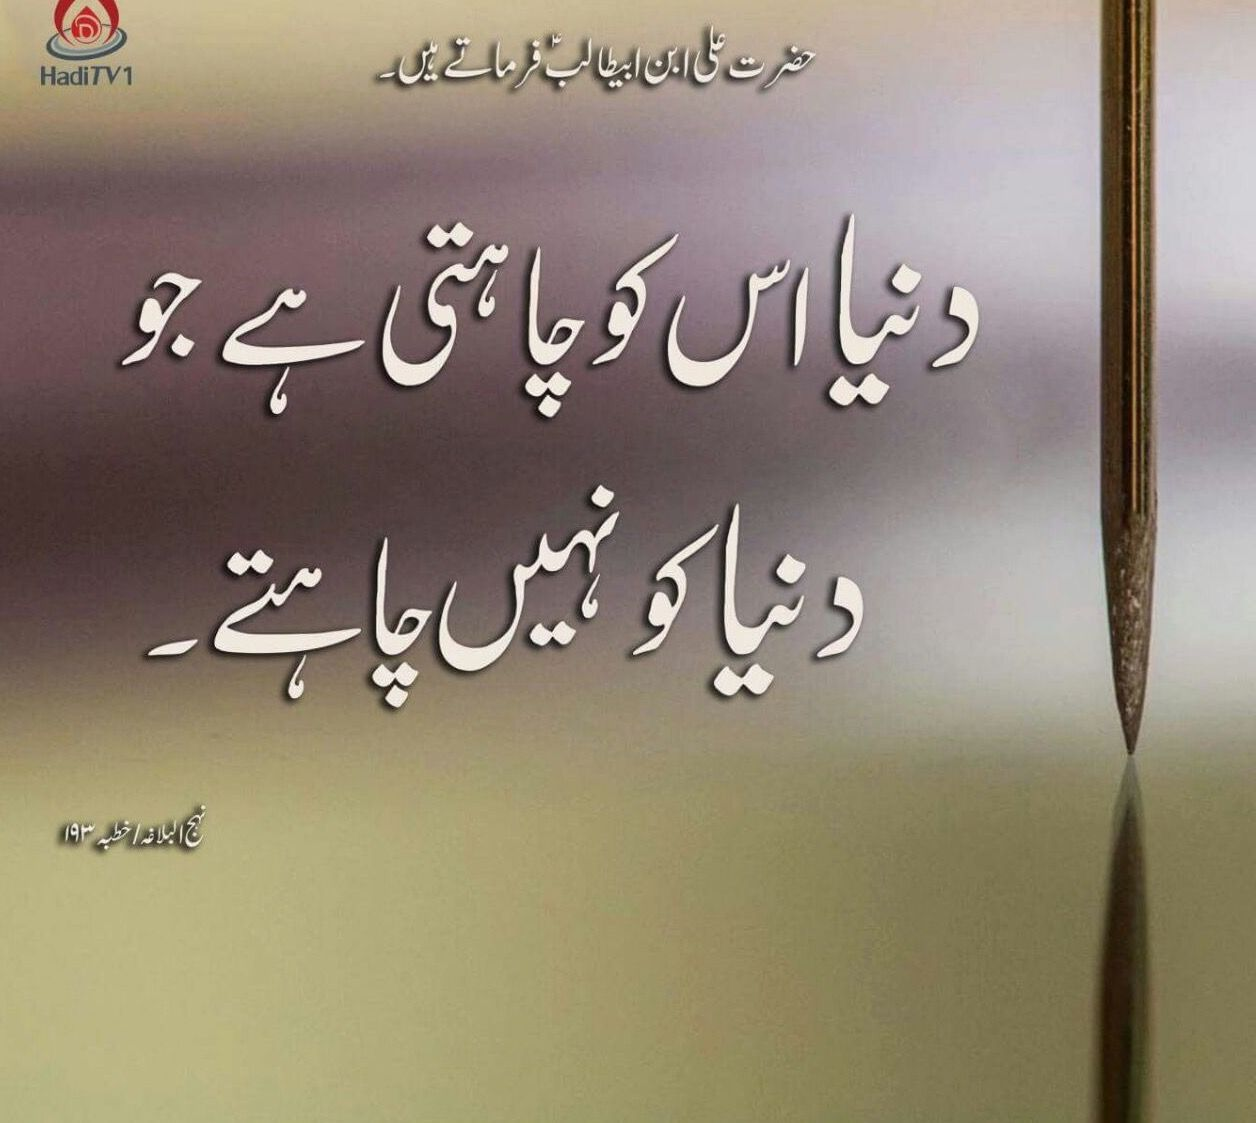 Hazrat Ali Famous Quotes In Urdu: Pin By Tahirawasti Wasti On Nahjul Balagha